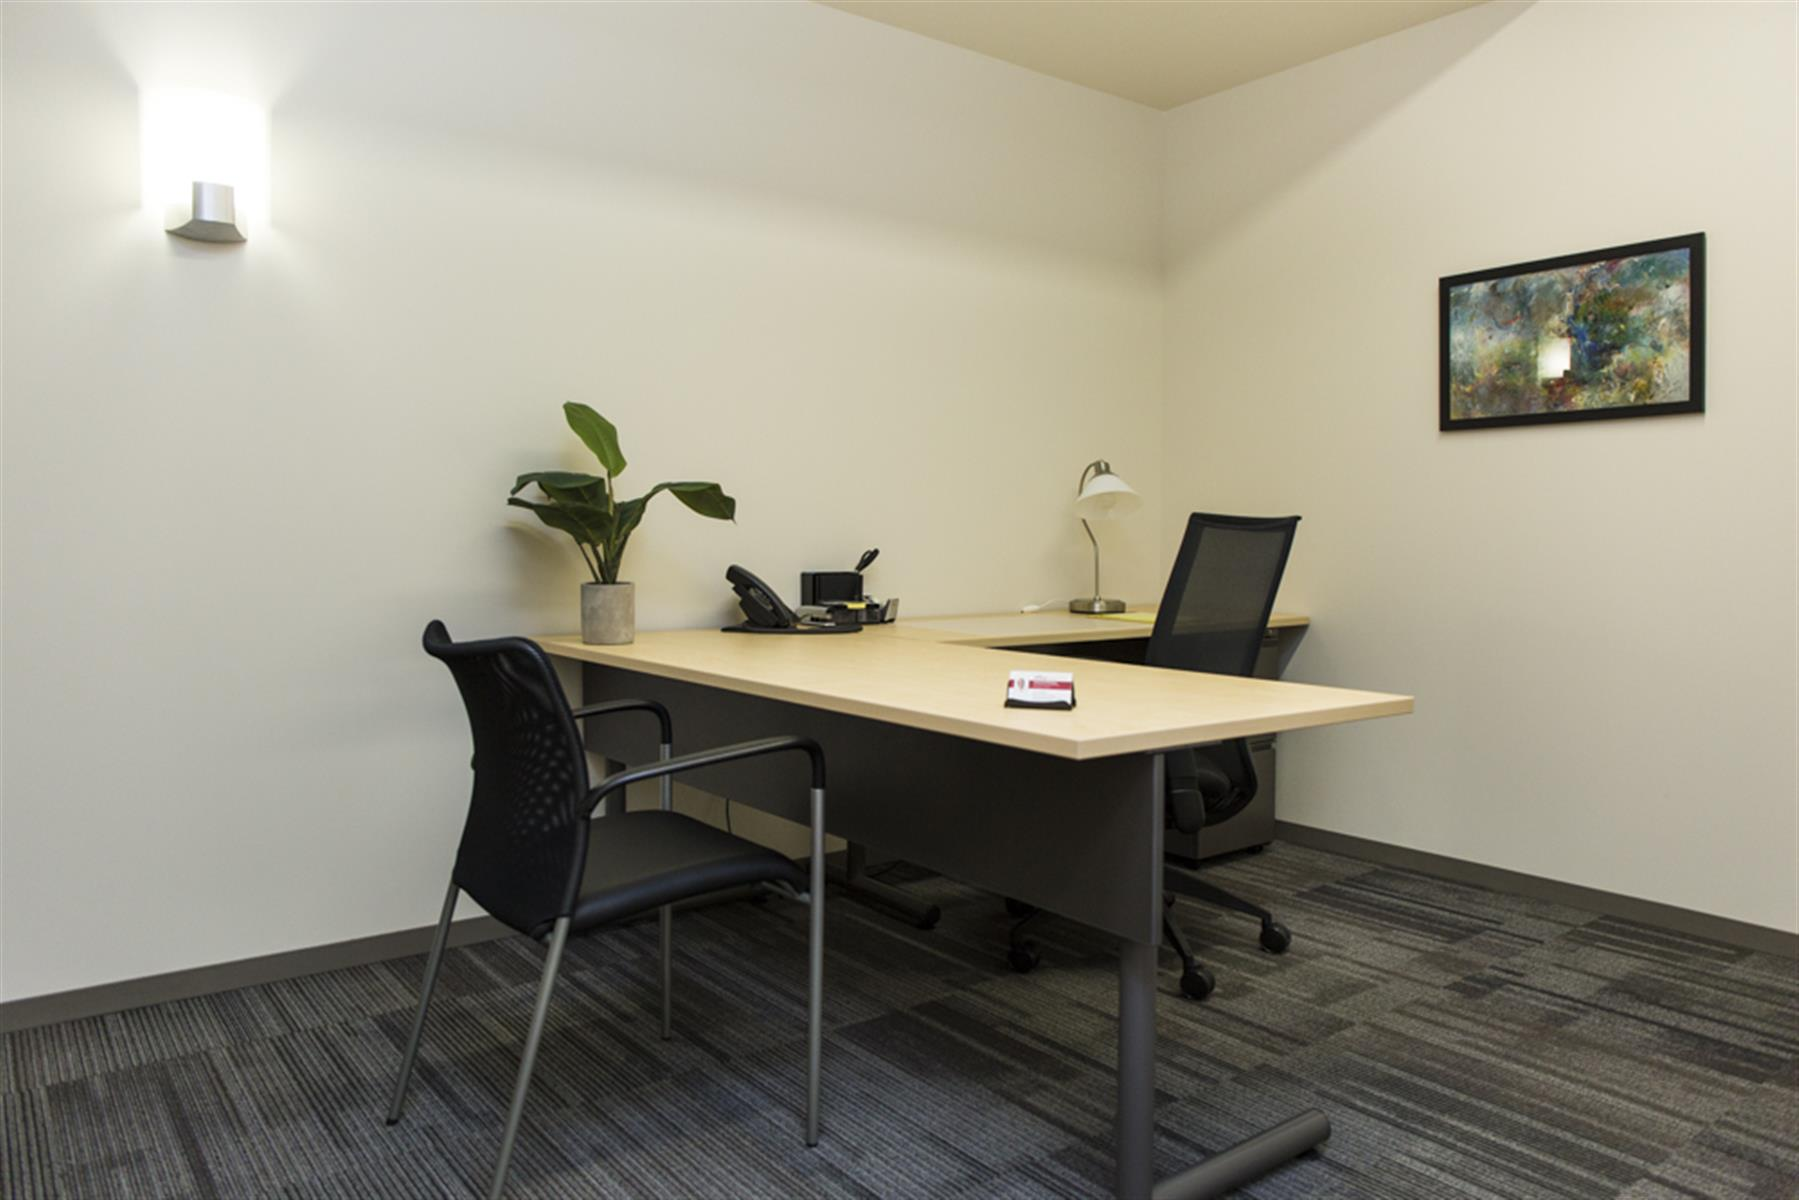 Office Evolution - Salt Lake City/Holladay - Day Office